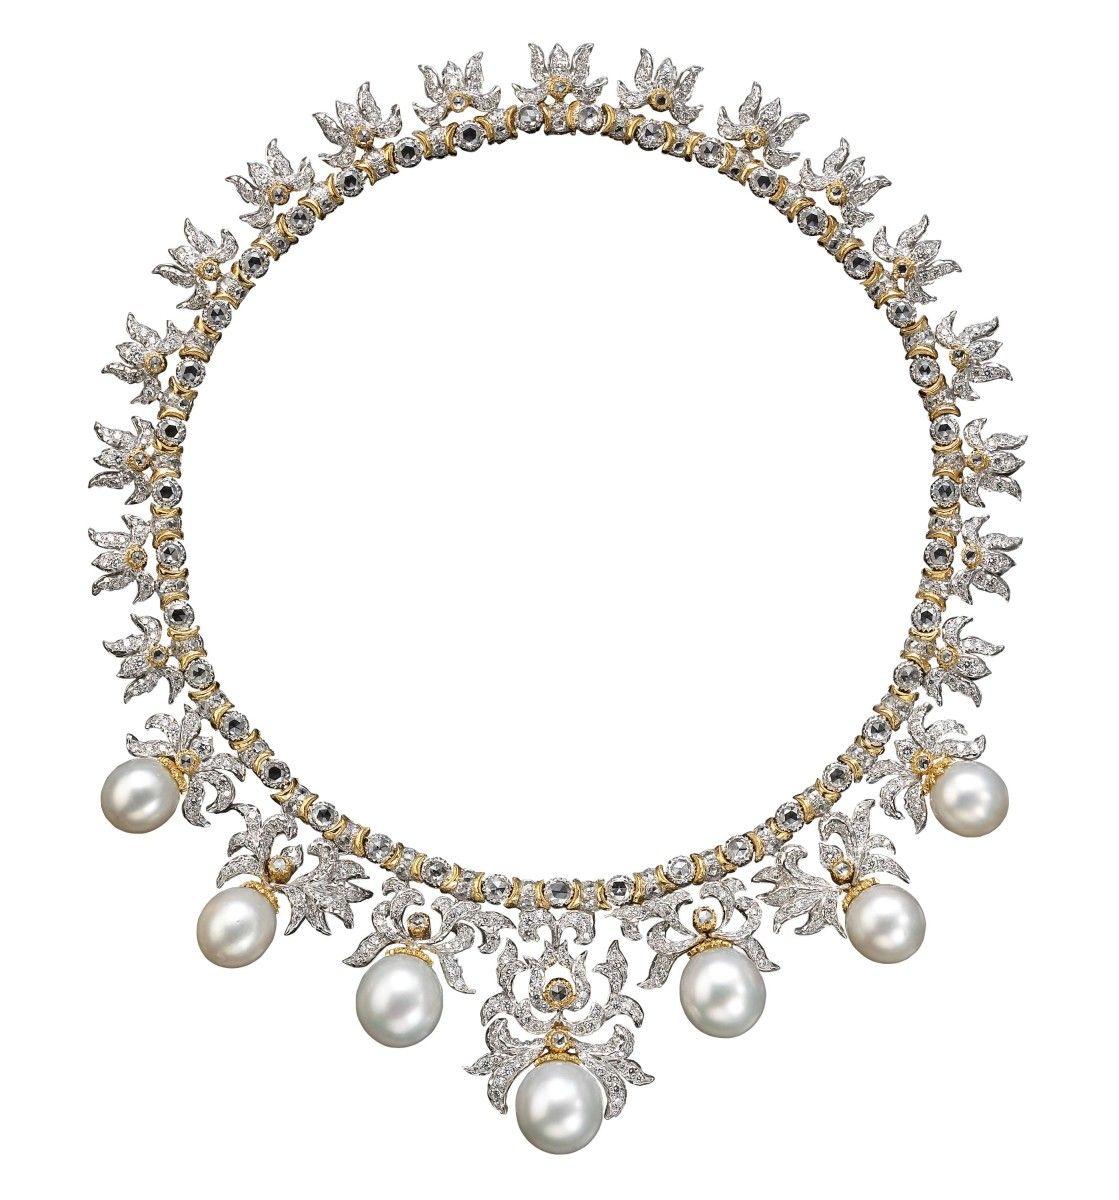 Andrea Buccellati, Necklace. White gold, diamonds. TEFAF 2015 Haute Joaillerie (13-22 March 2015) – stand 144